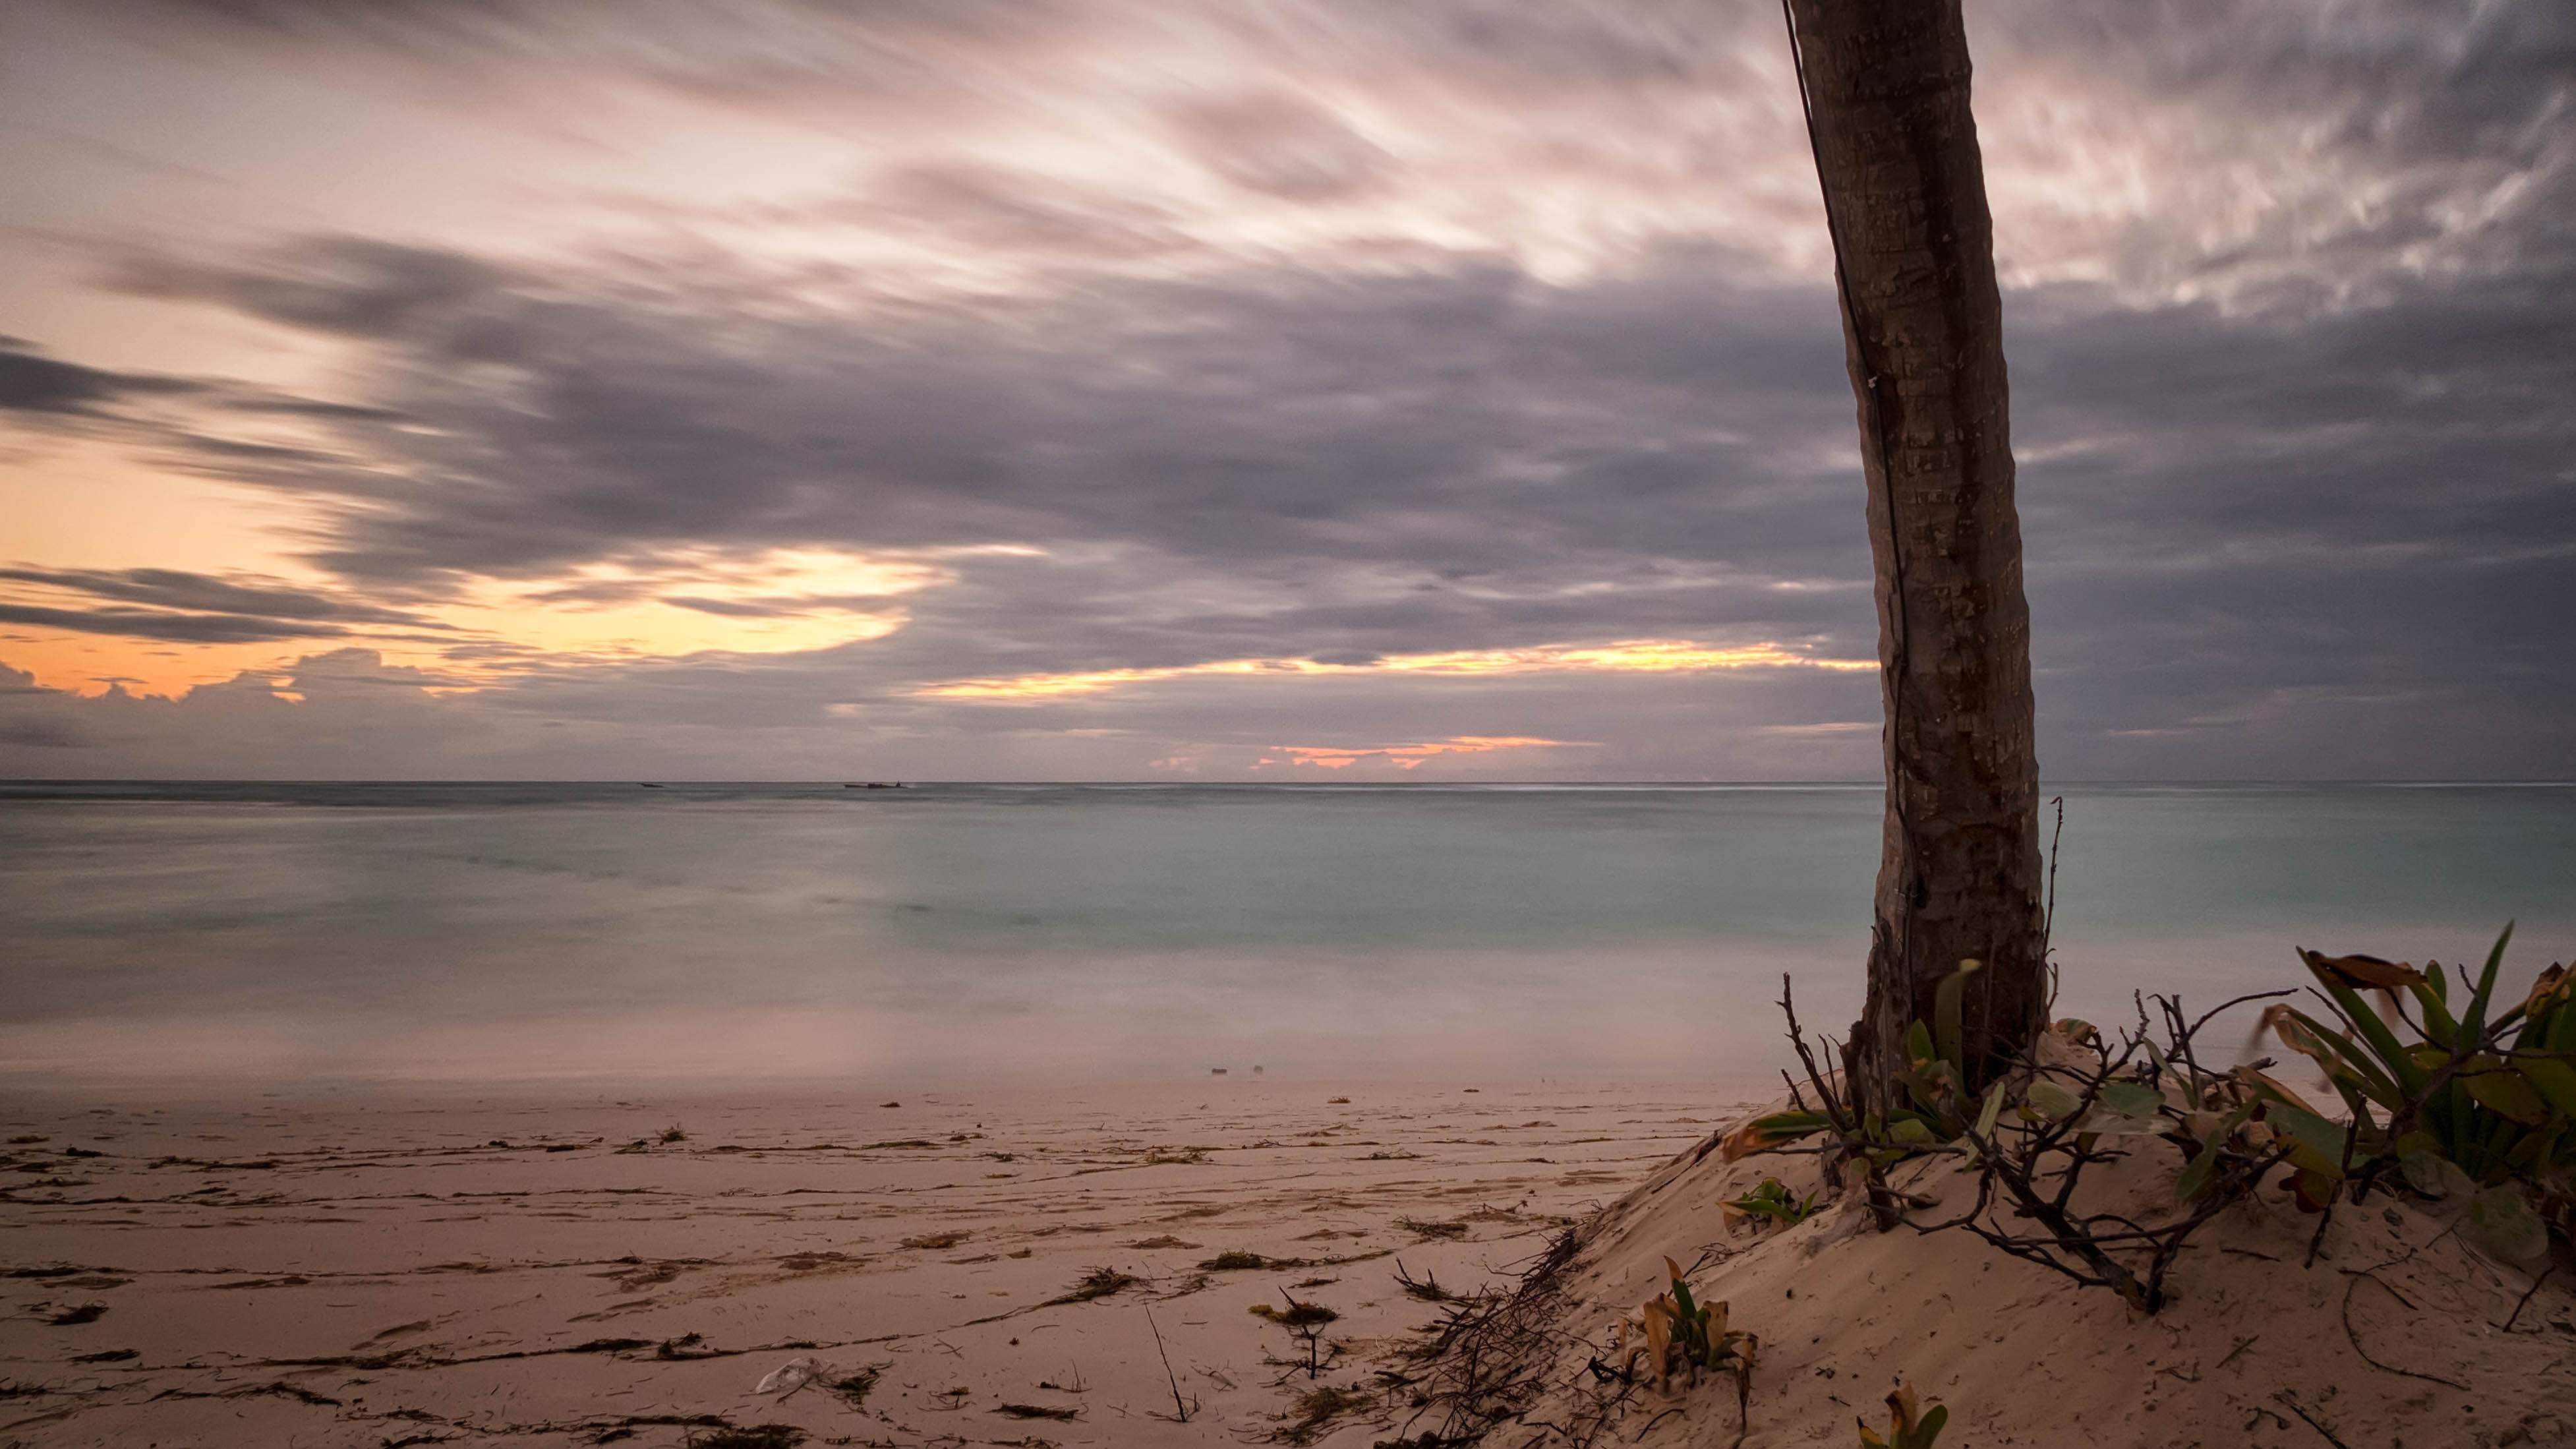 Sunrise, Bavaro, Dominican Republic, Beach, Cana, Dmc, Dominican, HQ Photo